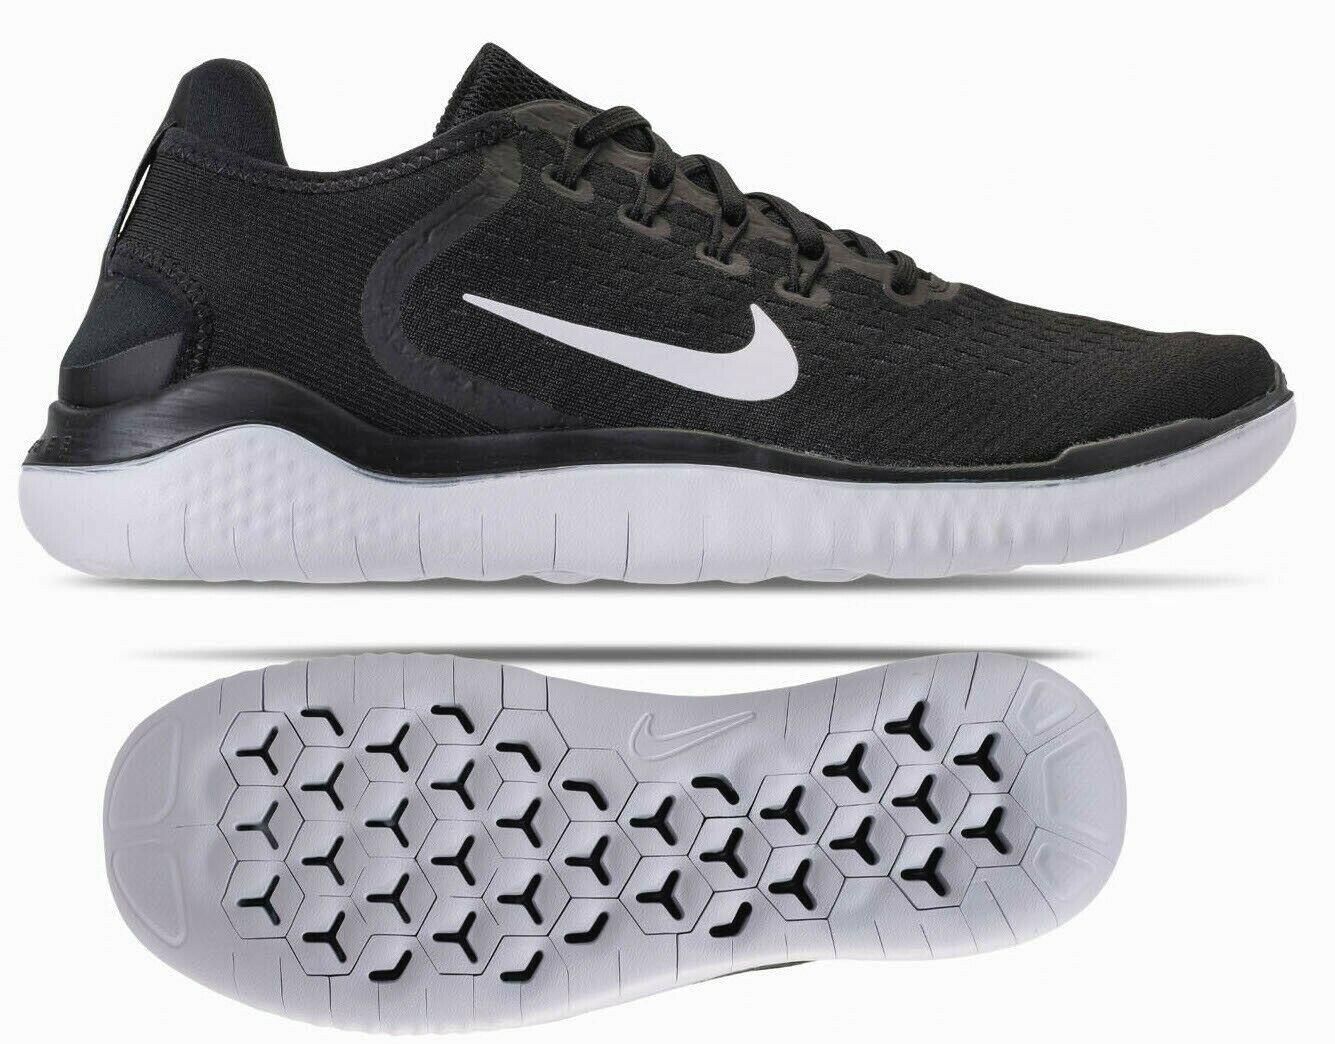 New NIKE Free RN 2018 Men's Running shoes black white all sizes